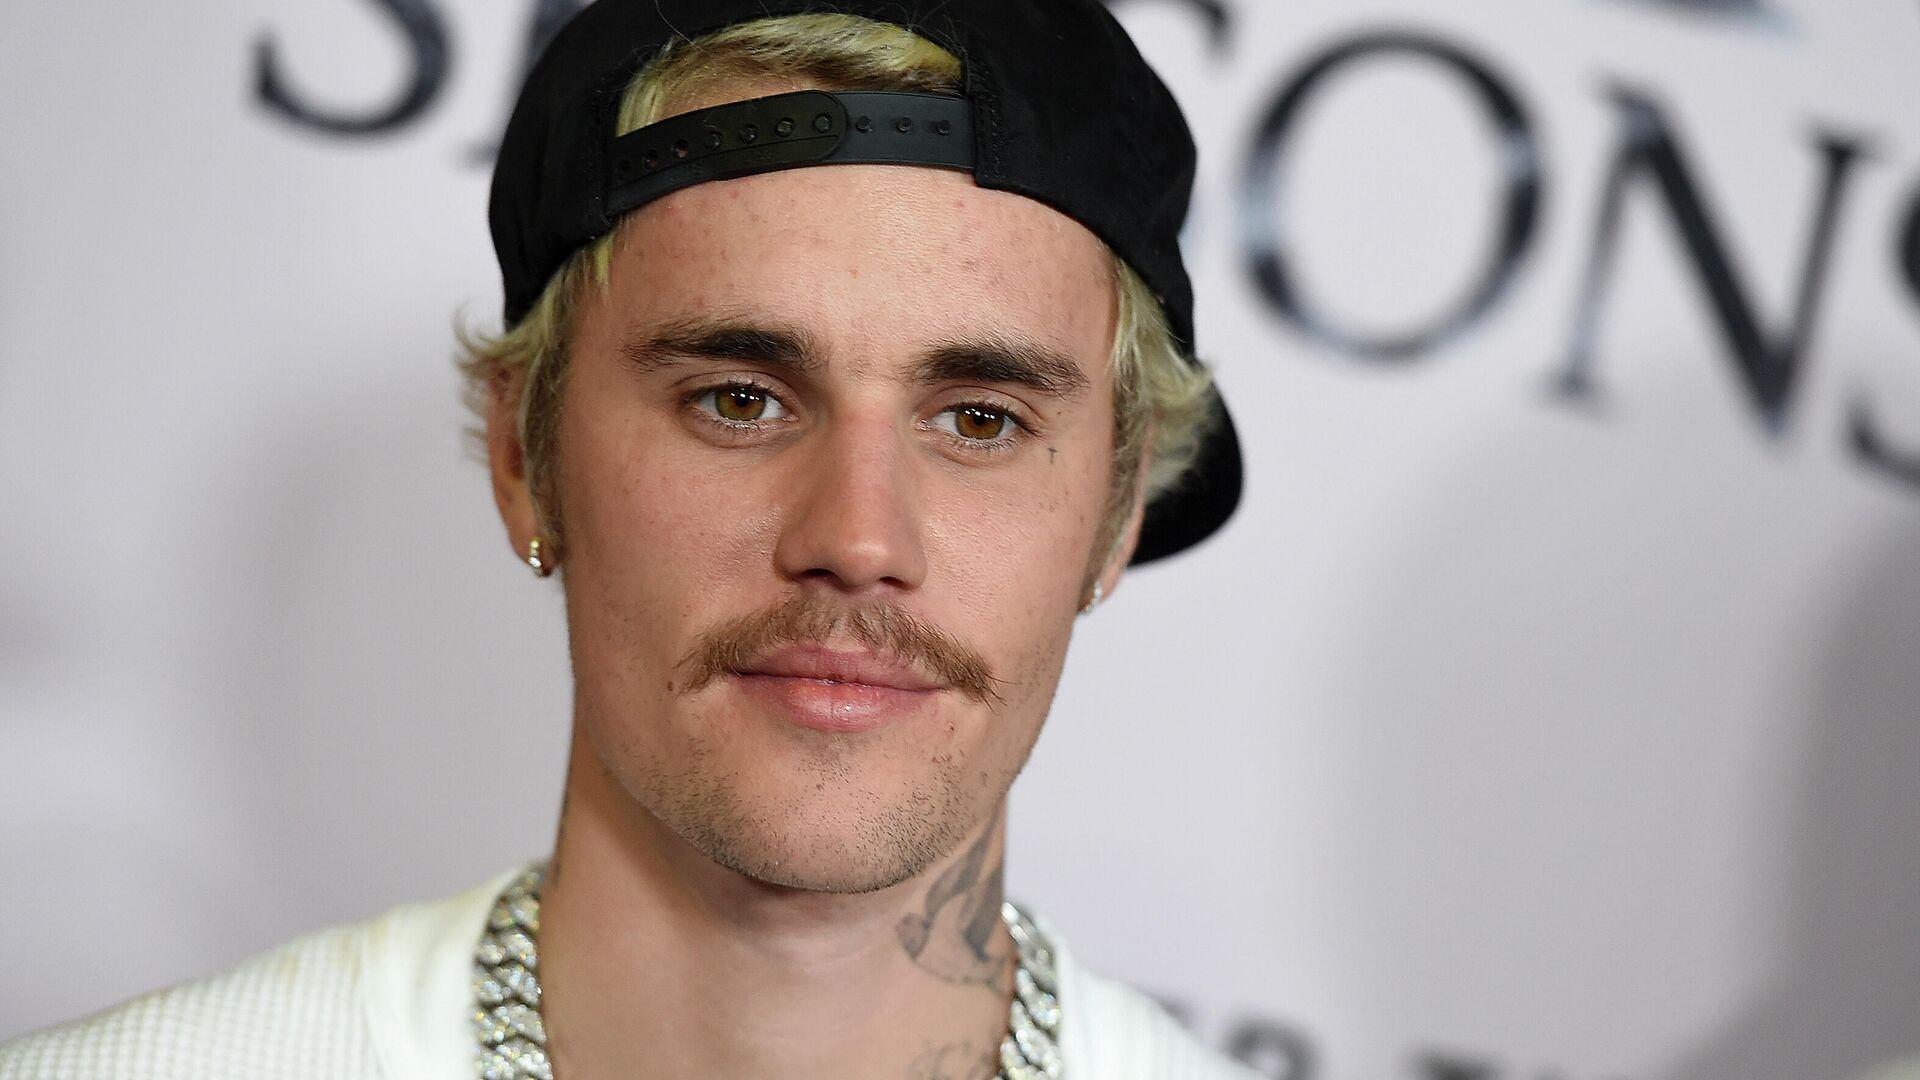 Justin Bieber, cantante canadiense - Sputnik Mundo, 1920, 01.03.2021